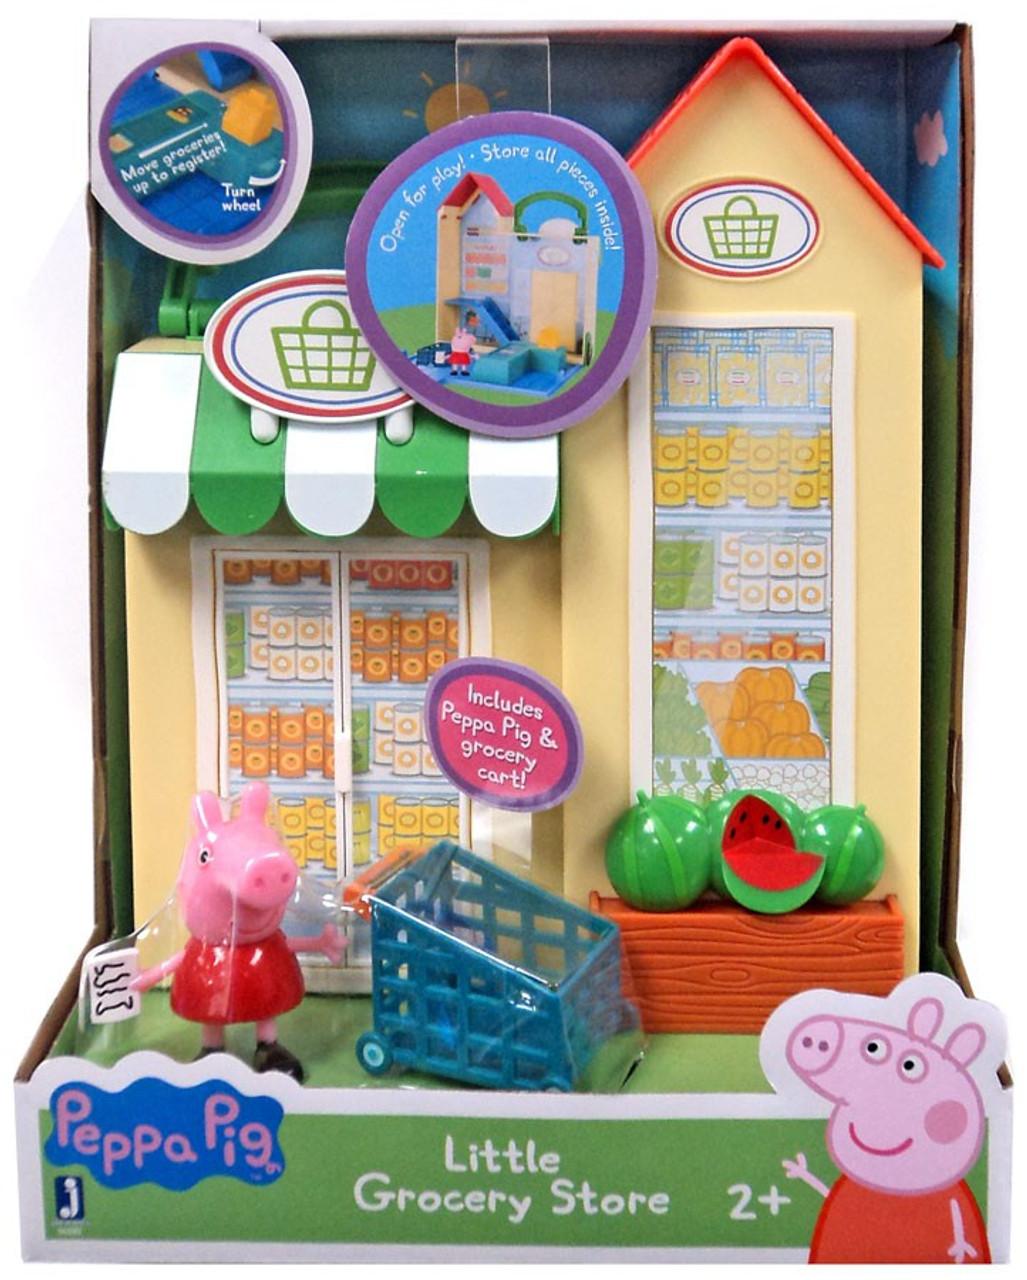 peppa pig little grocery store playset jazwares toywiz. Black Bedroom Furniture Sets. Home Design Ideas